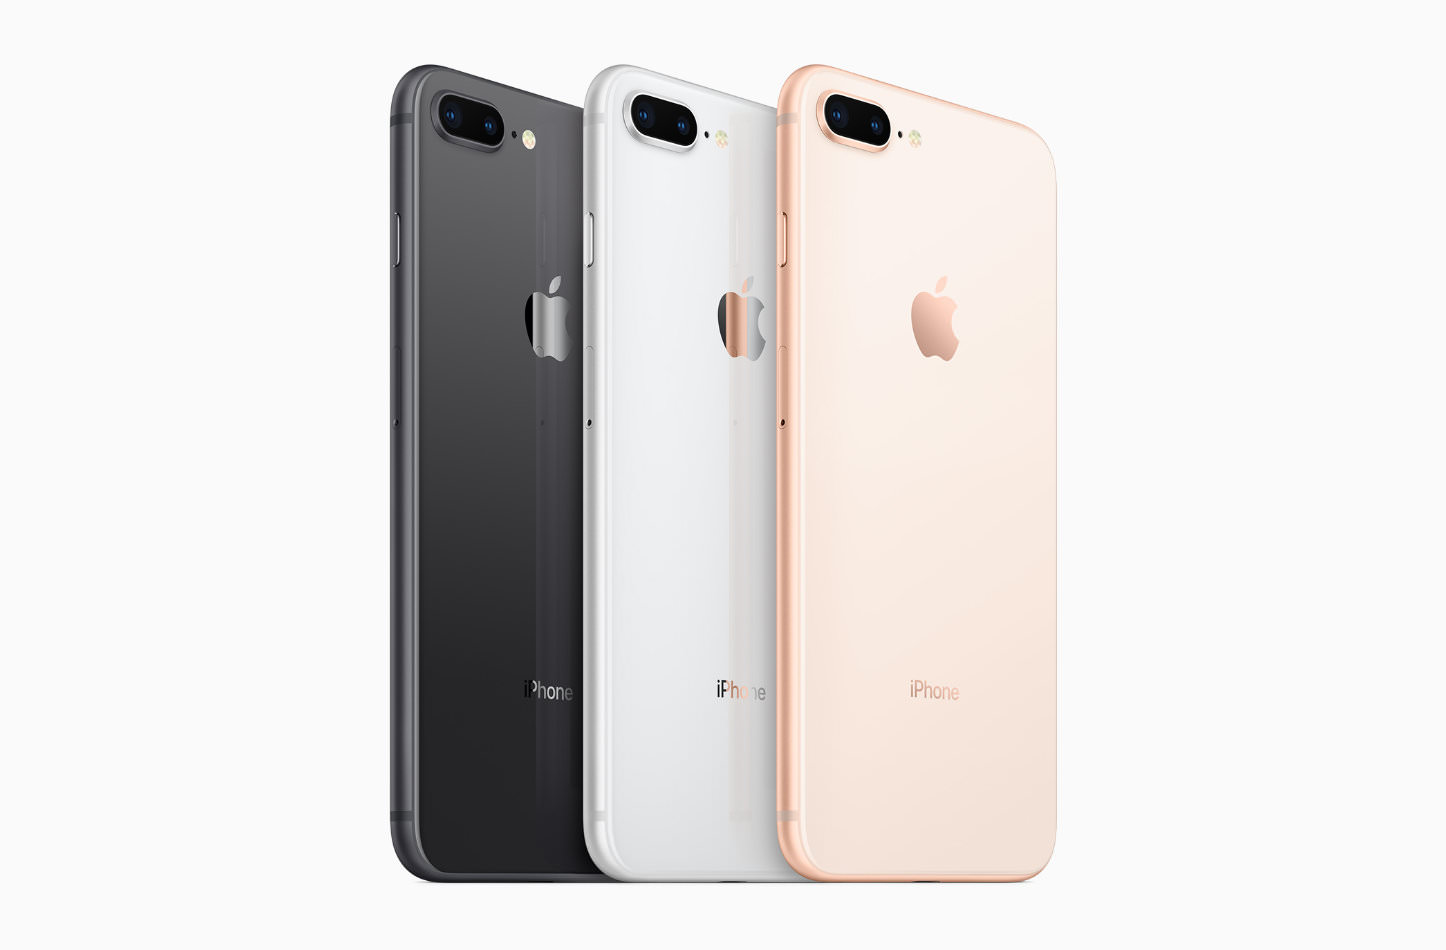 iphone-8-color-models